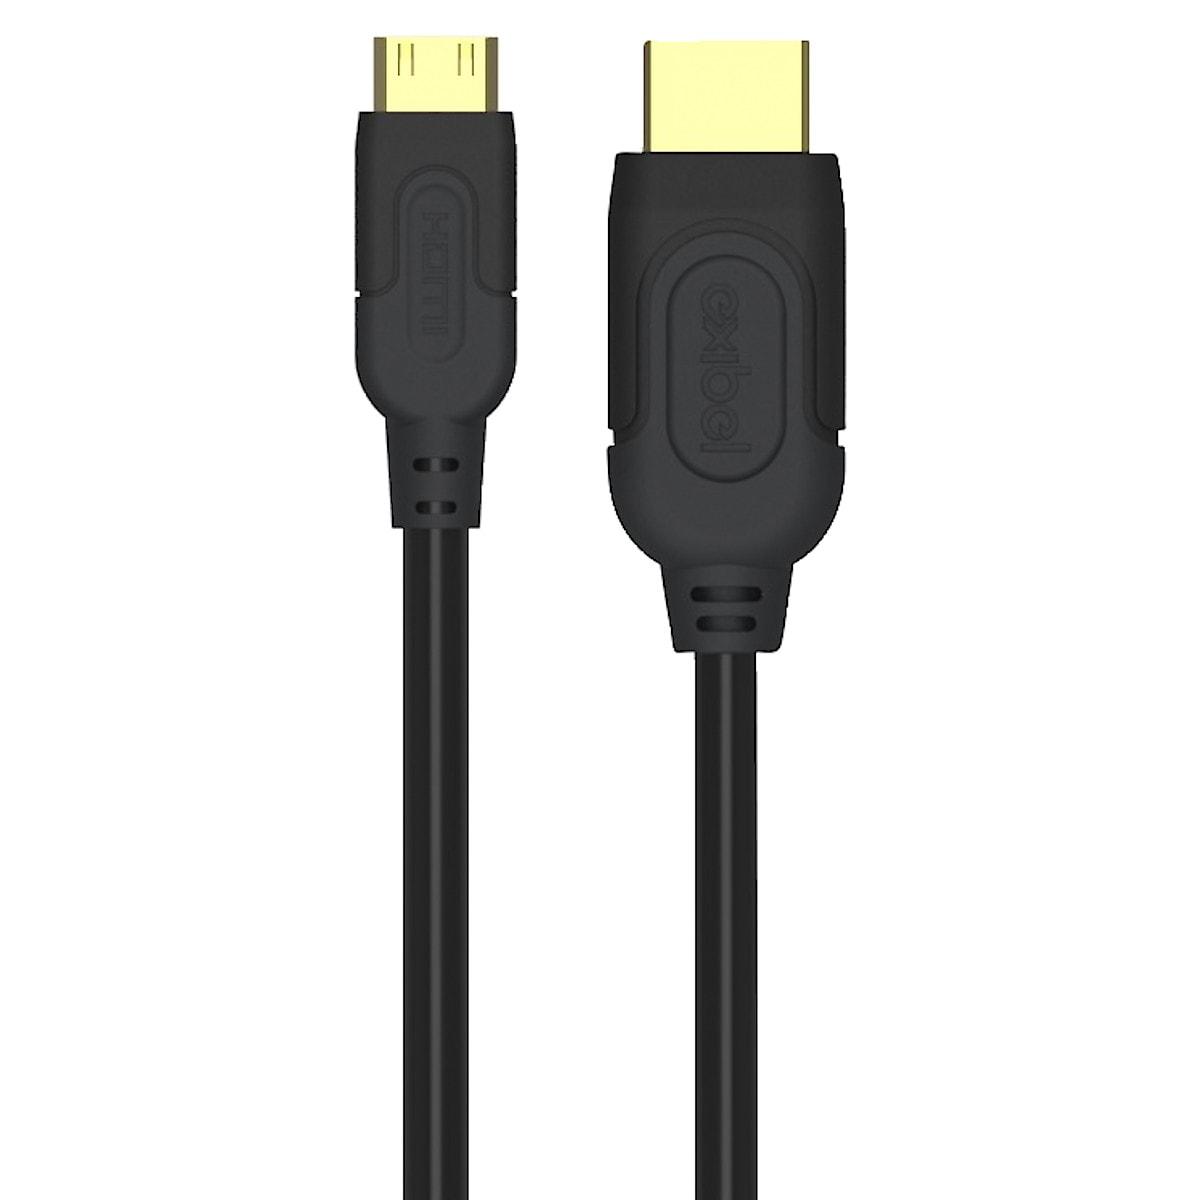 HDMI-adapterkabel Exibel